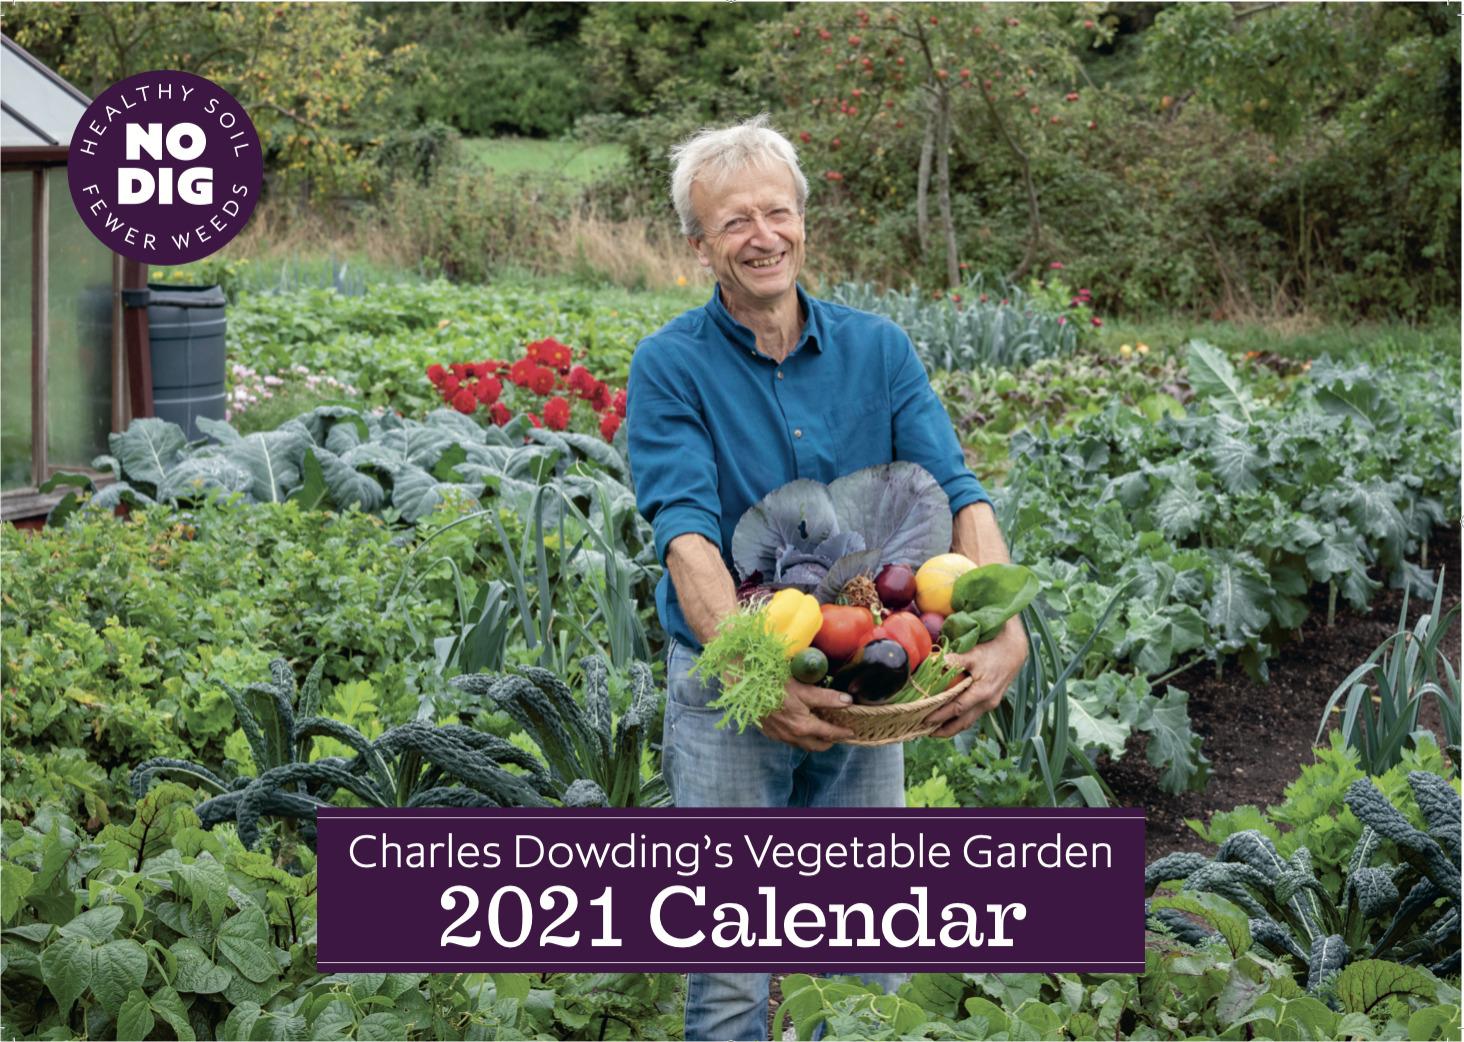 Gardening Calendar 2021